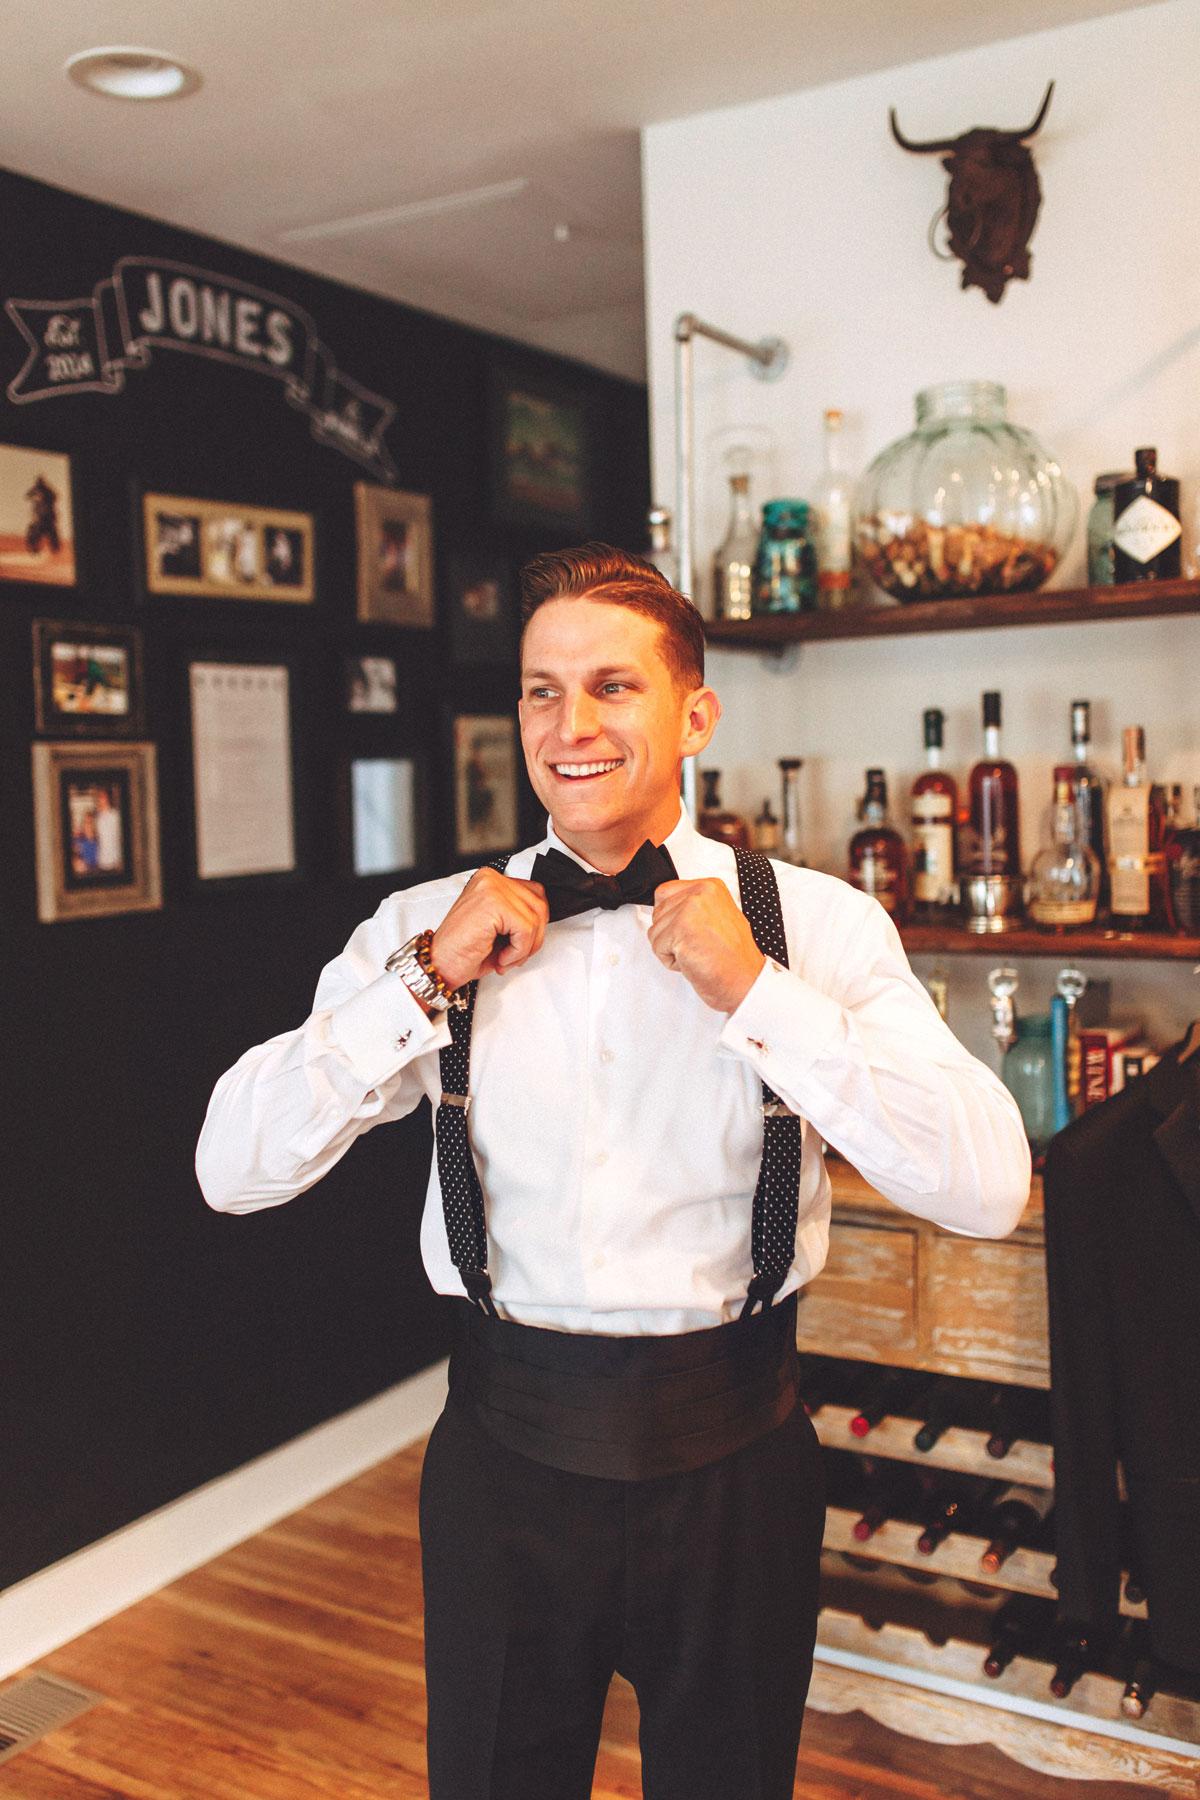 Me & Mr. Jones Wedding, Nashville Wedding, Bourbon Bar, Kentucky Wedding, Groomsmen Getting Ready